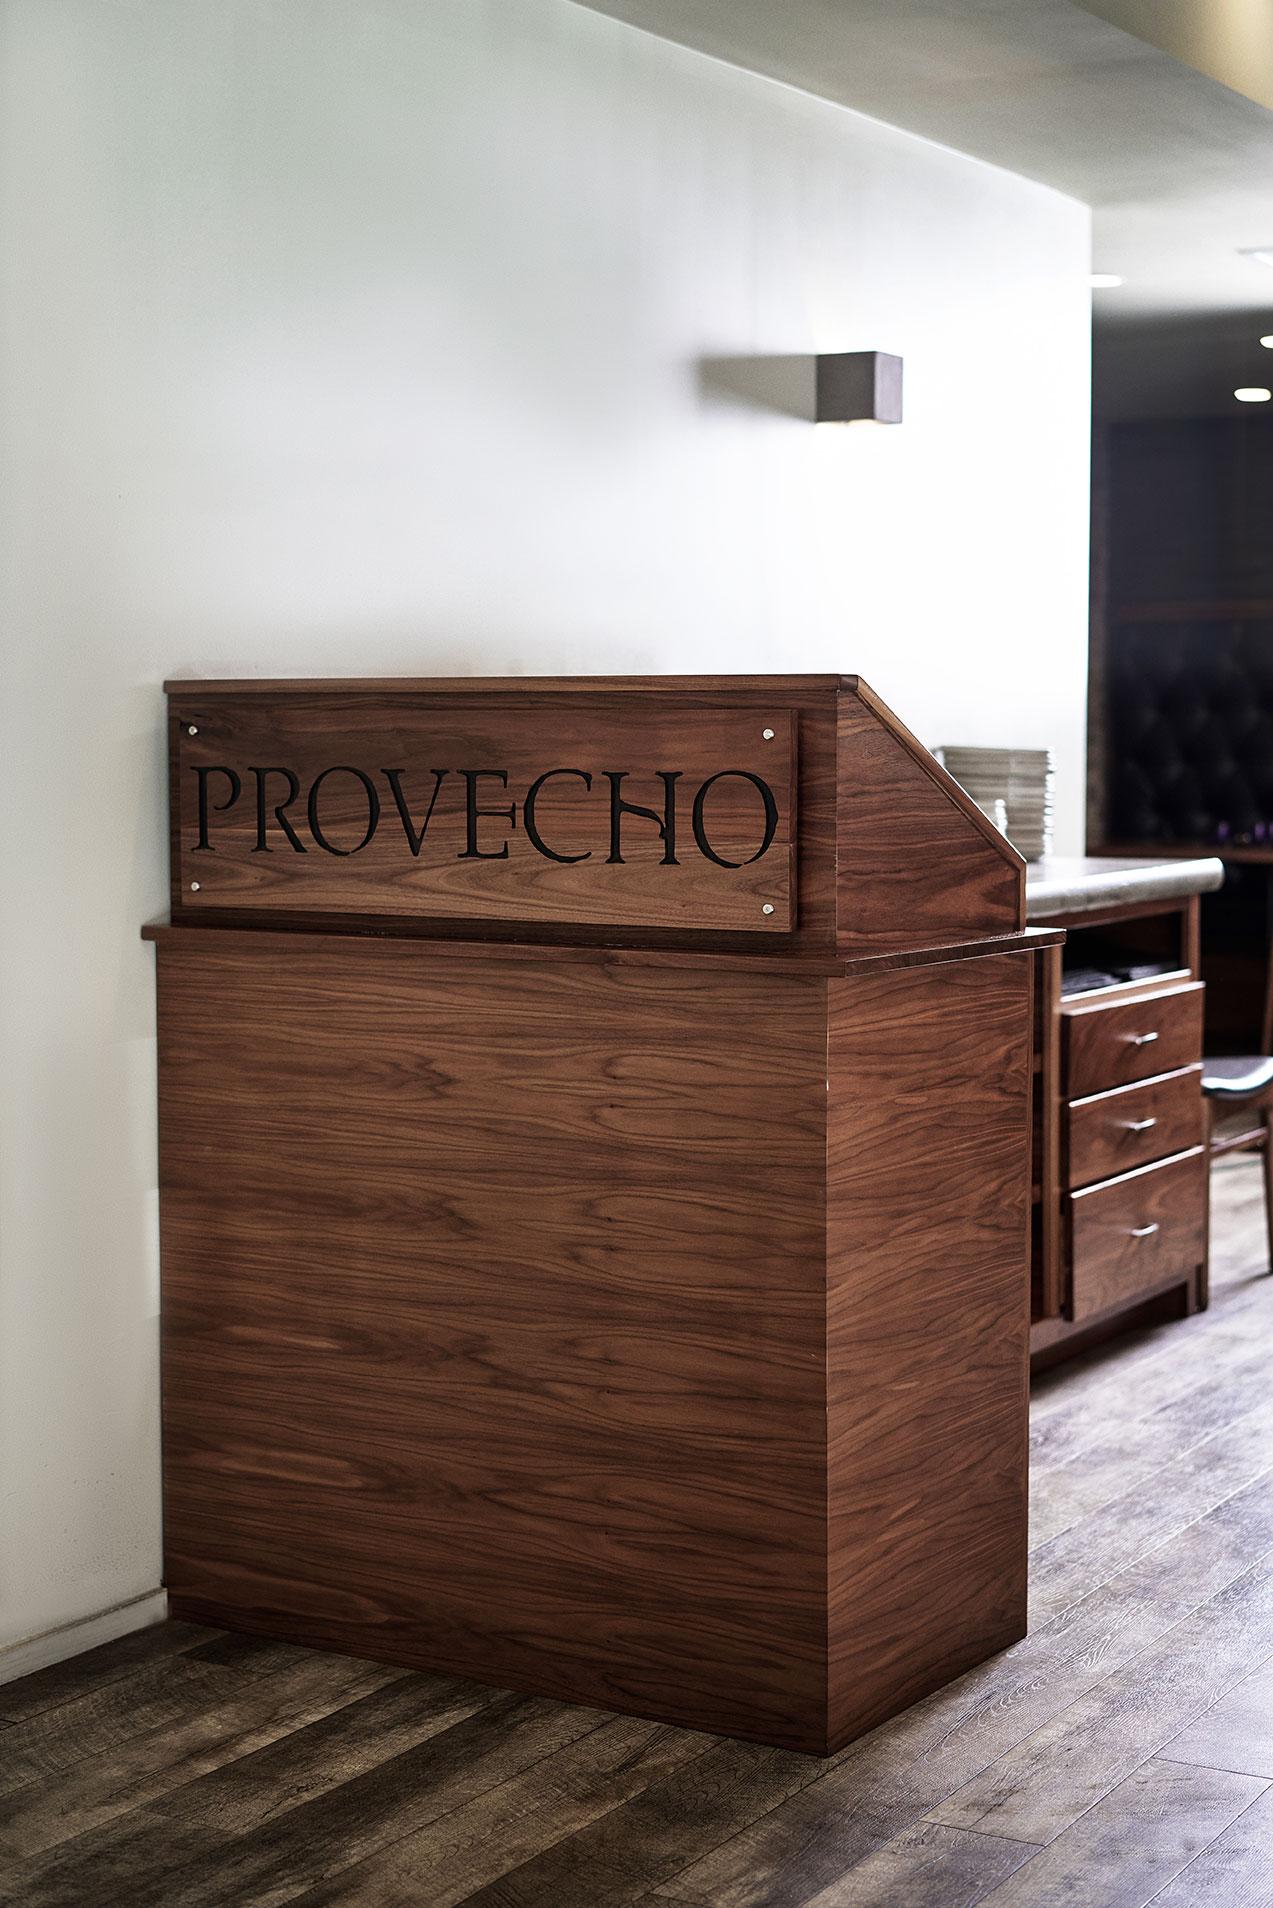 Provecho Latin Provisions